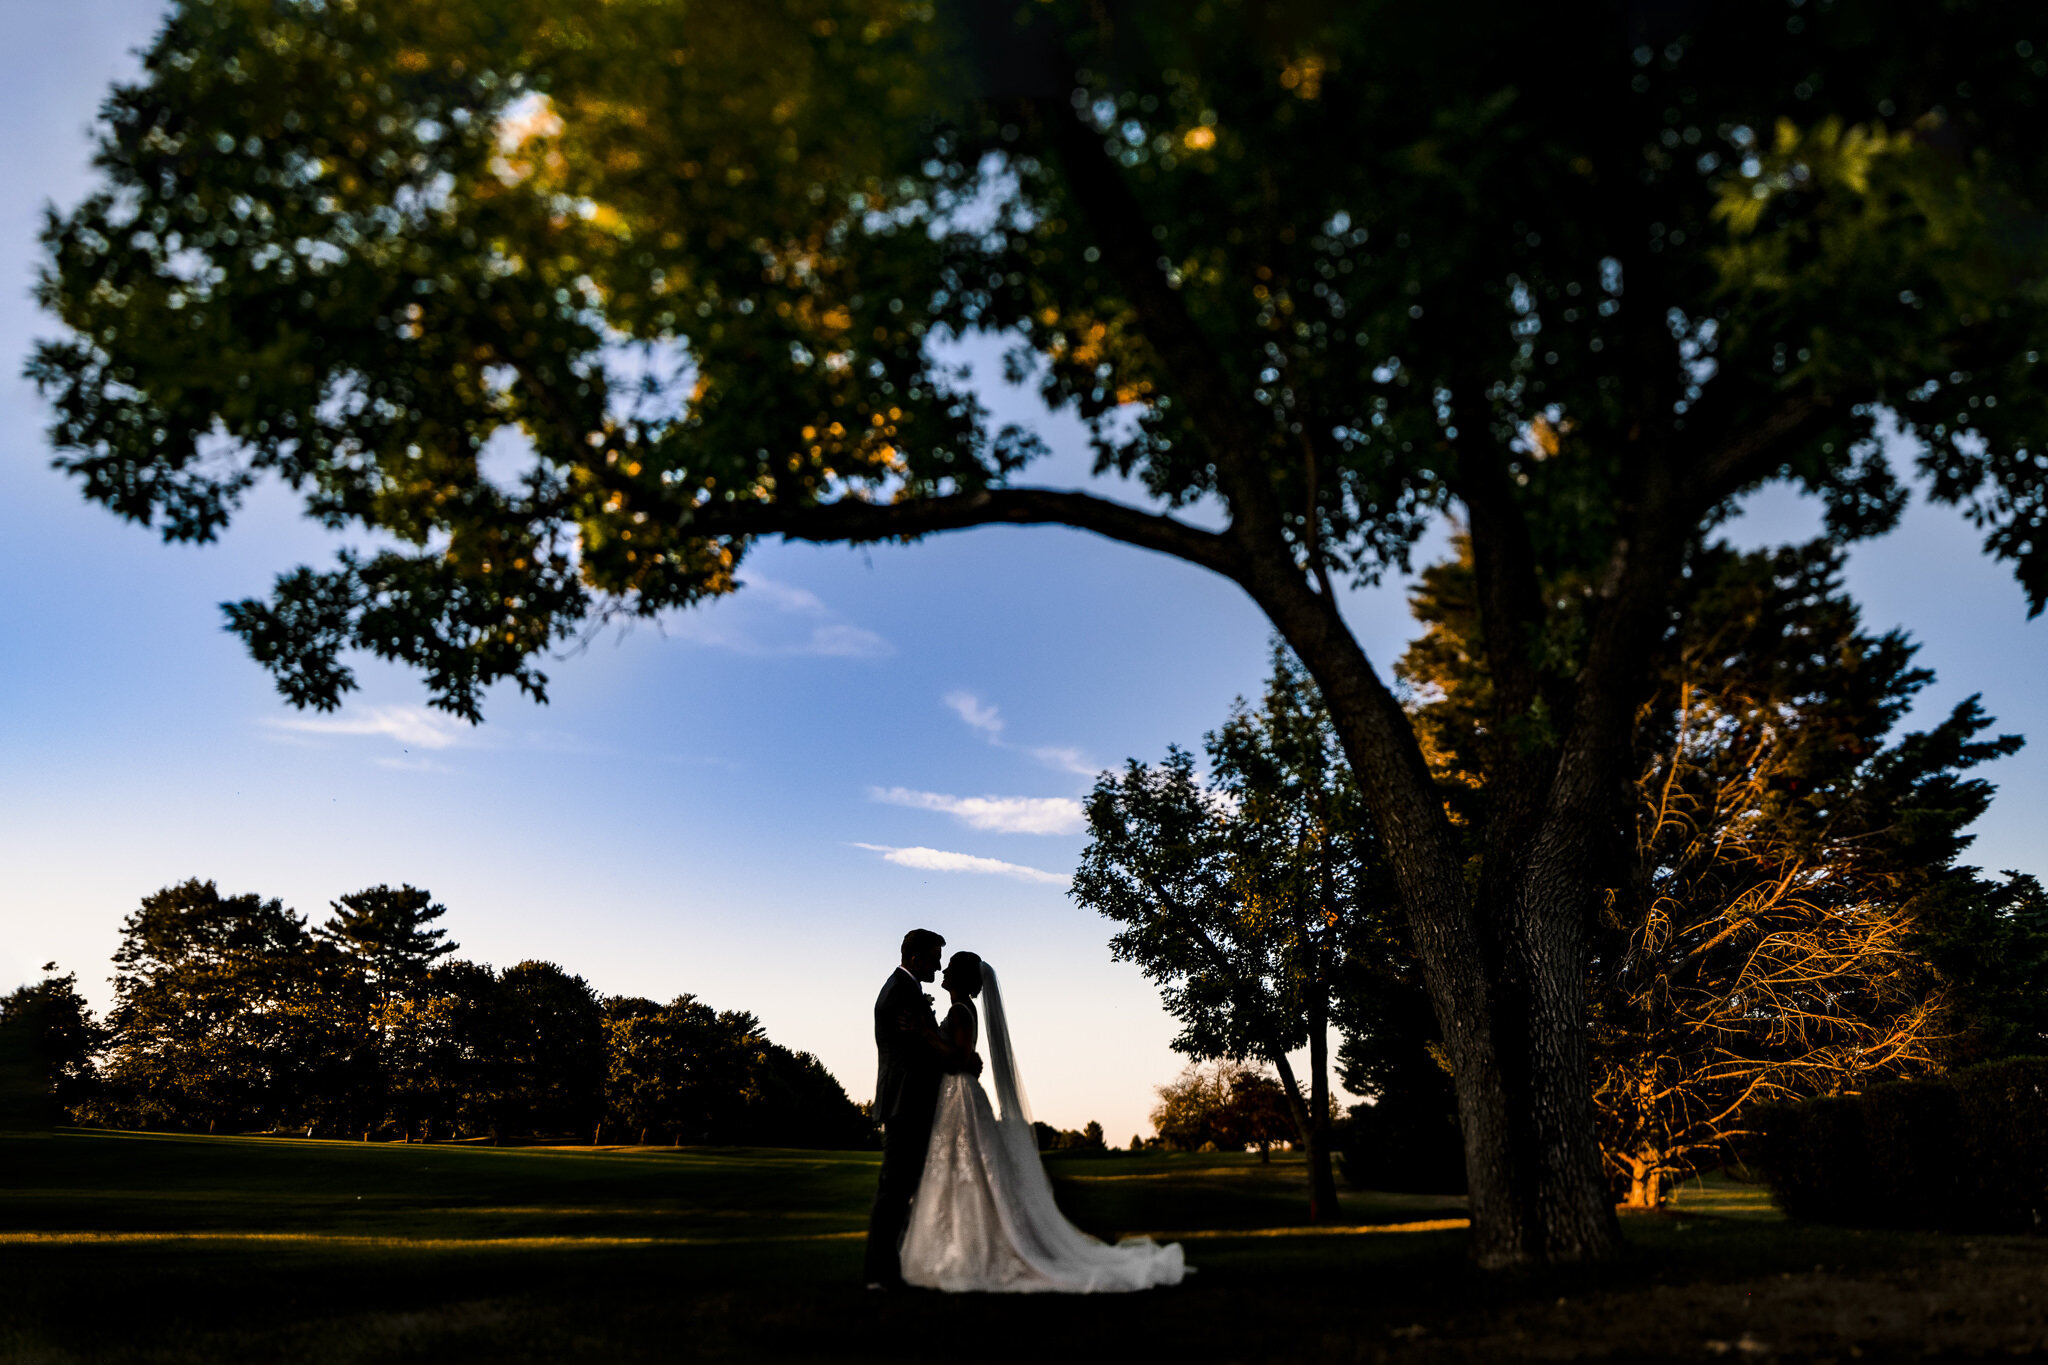 Coyle-Forsgate-Country-Club-Wedding-Photographer-26.JPG